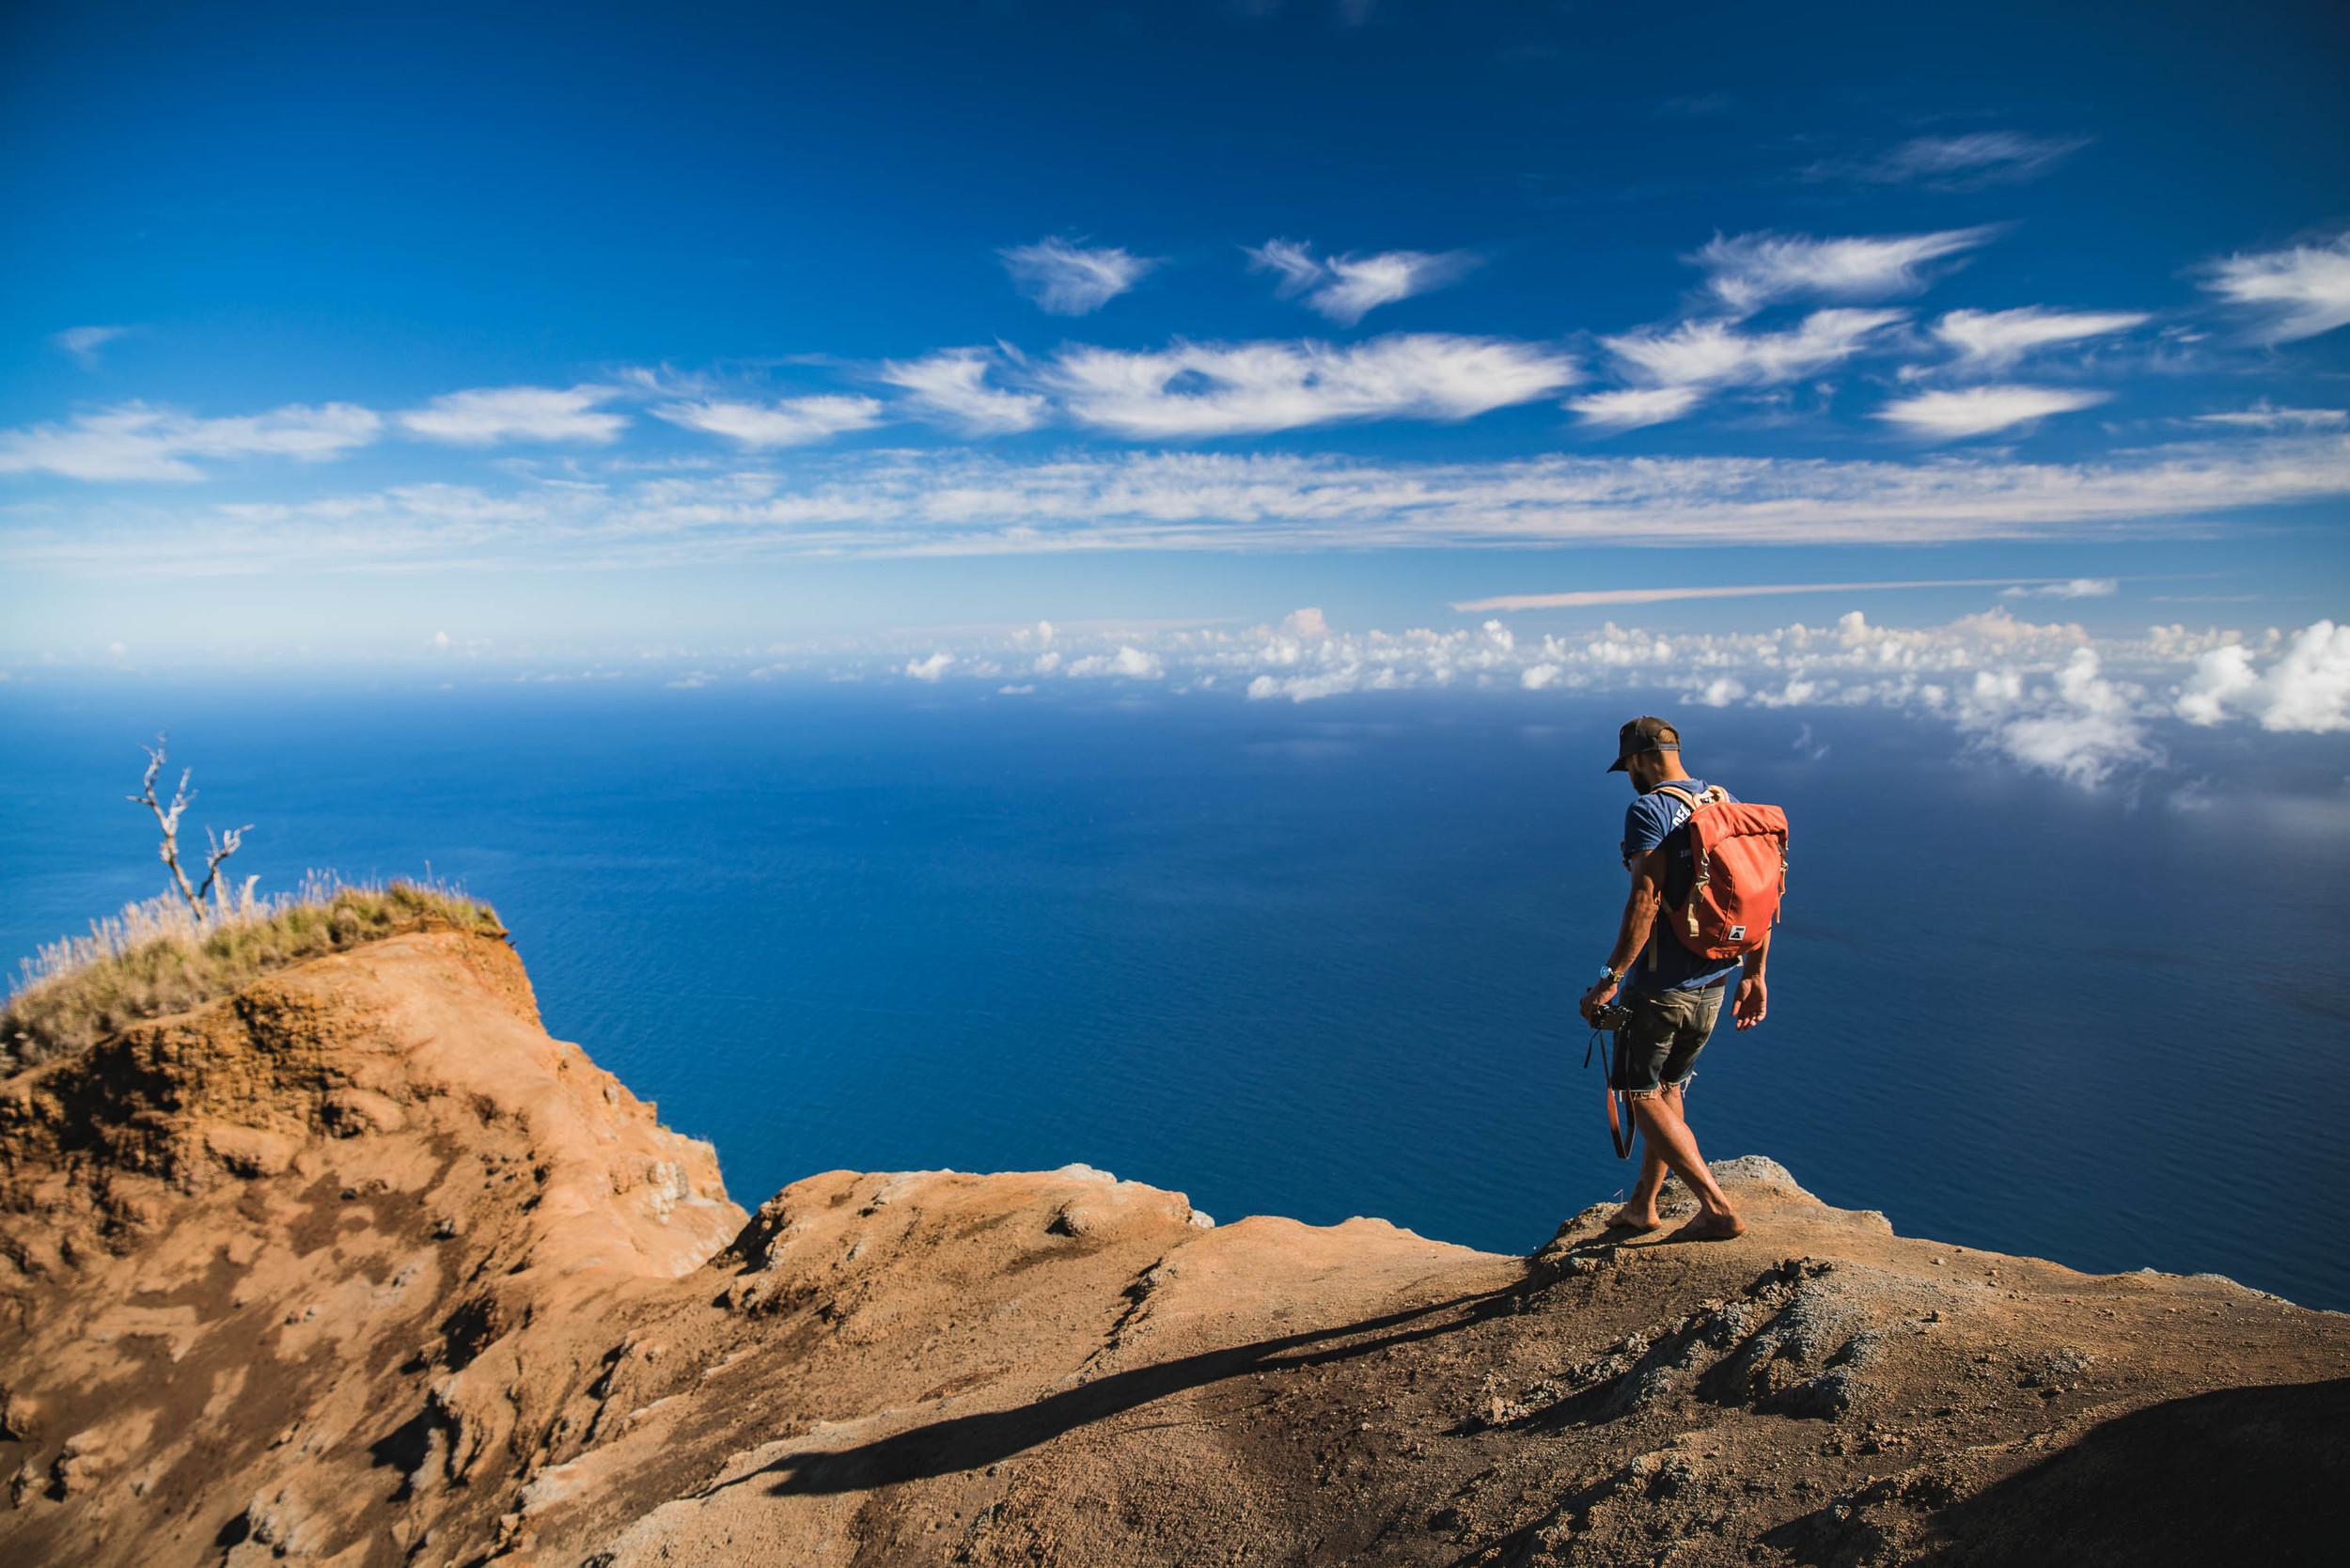 bryce-johnson-kalalau-ridge-kauai-hiking-hammock-palmwood-aloha-exchange-8.jpg